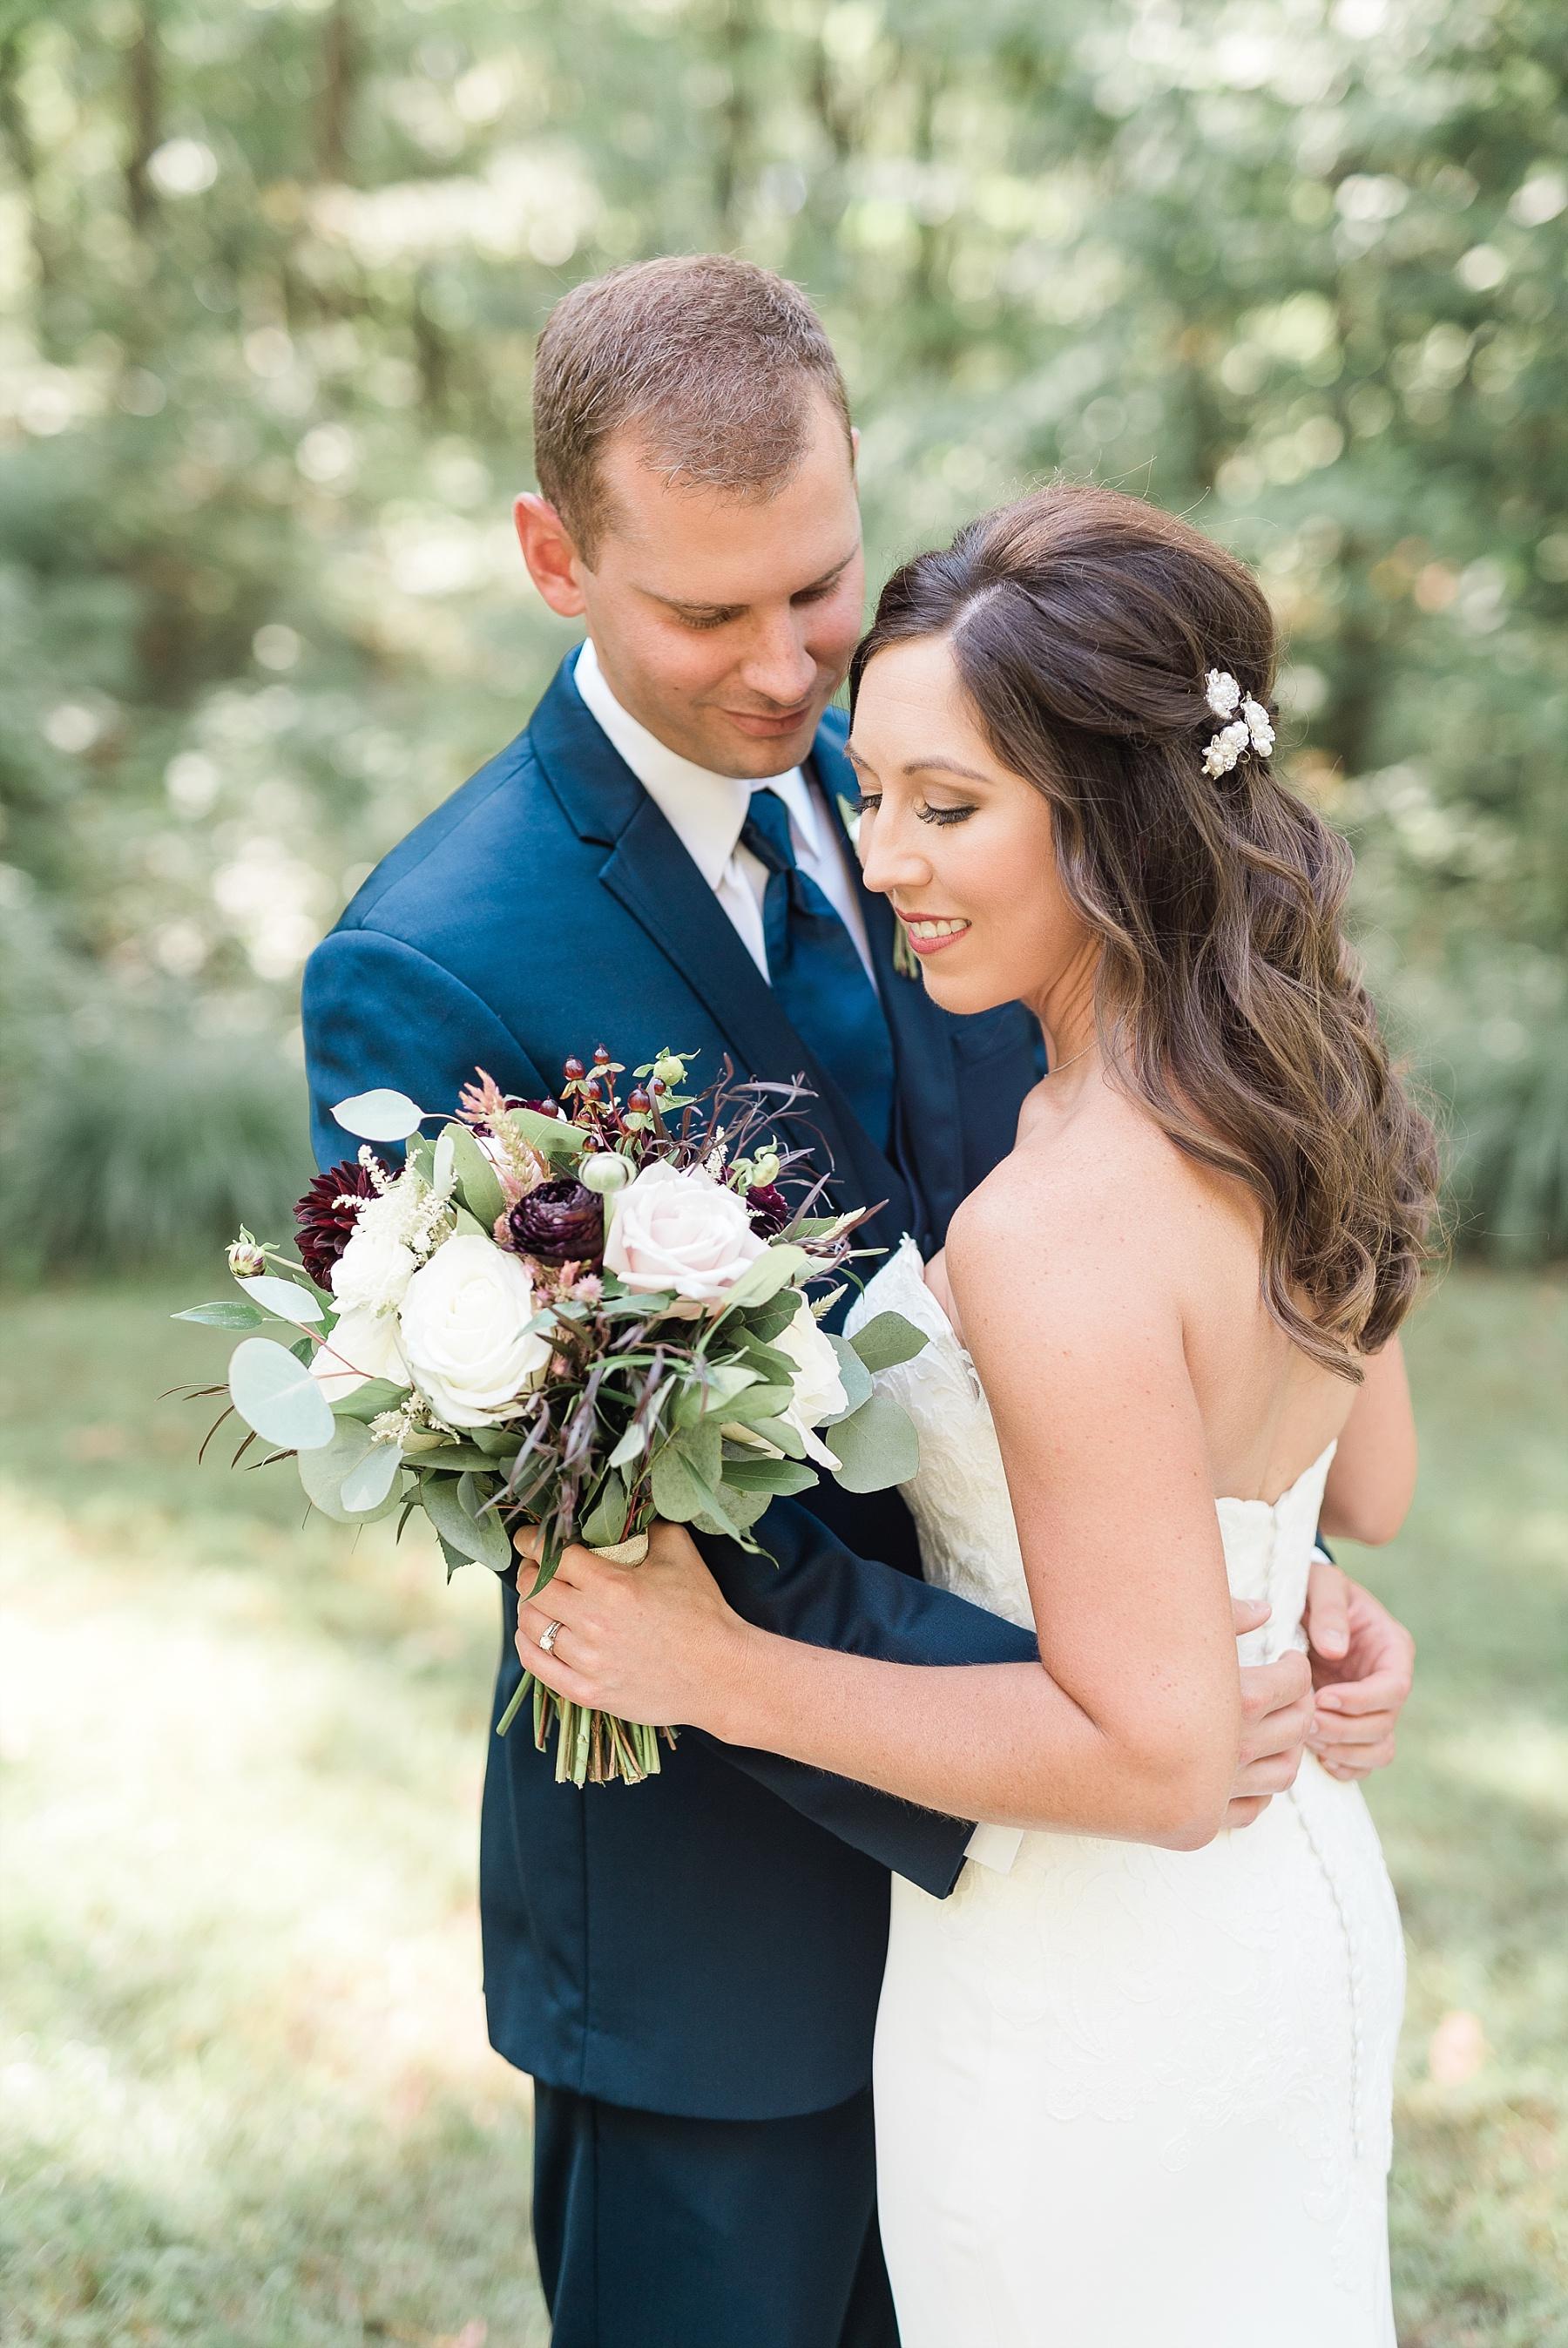 Romantic Summer Sunset Wedding Ceremony at Little Piney Lodge St. Louis Missouri by Kelsi Kliethermes Photography Fine Art Photographer_0046.jpg